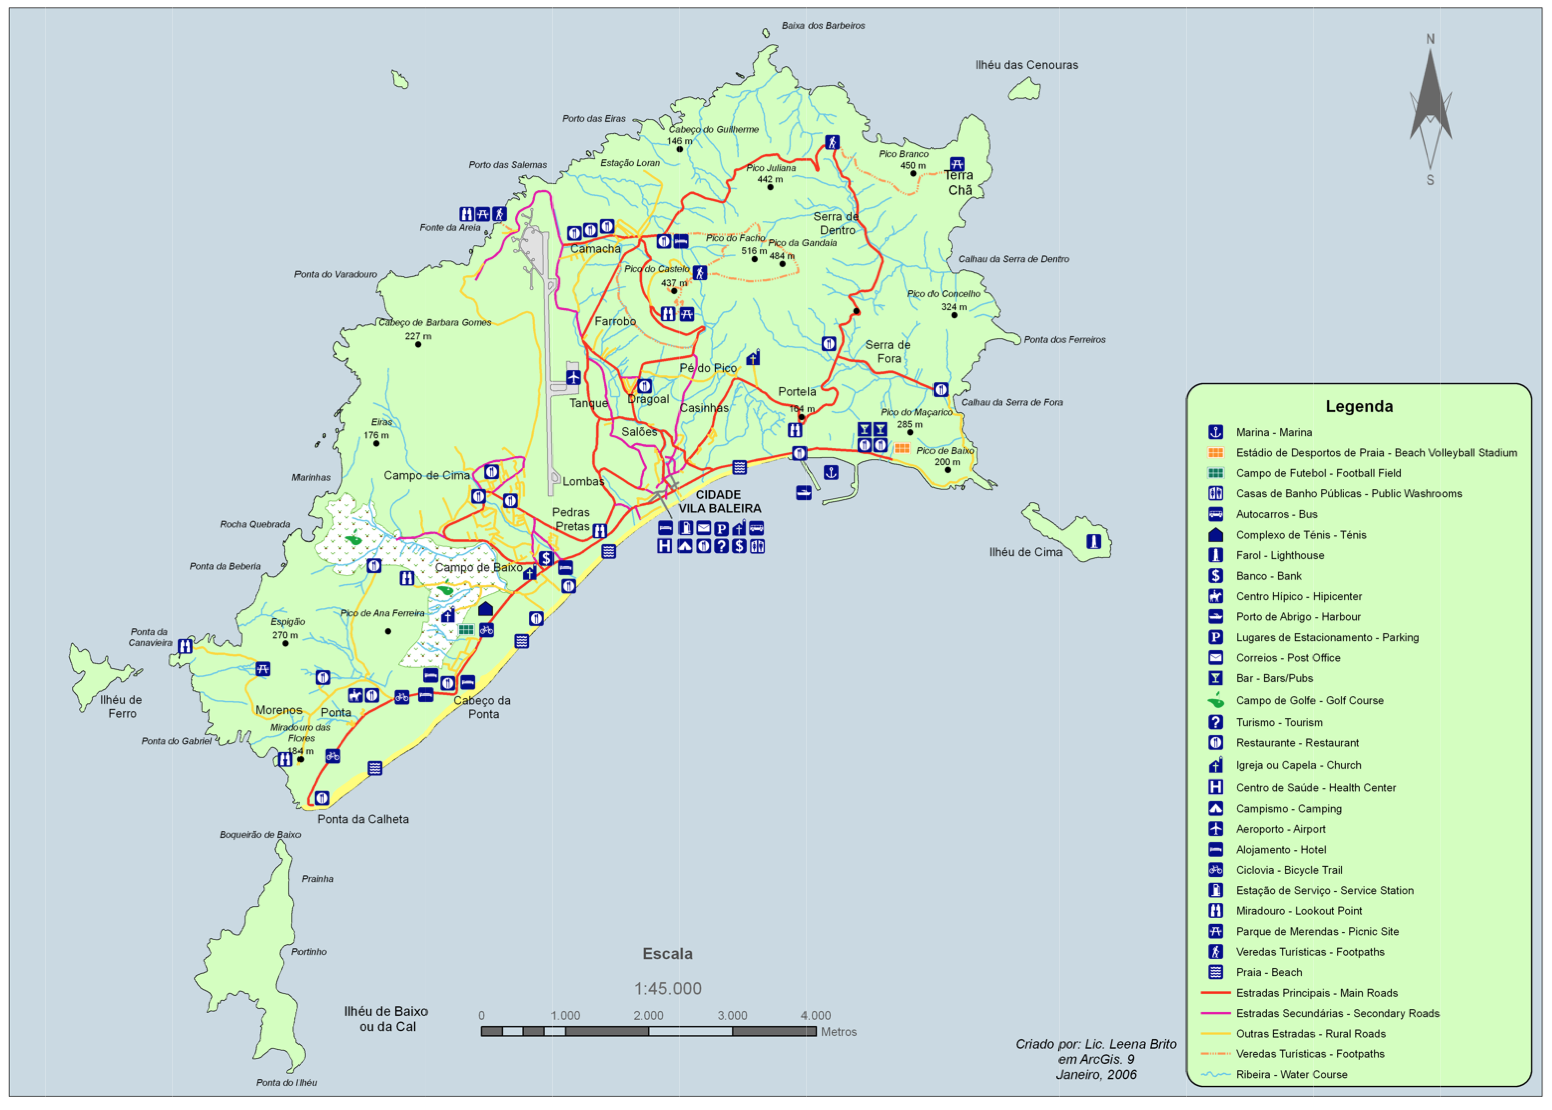 mapa da ilha do porto santo Mapa | Município mapa da ilha do porto santo